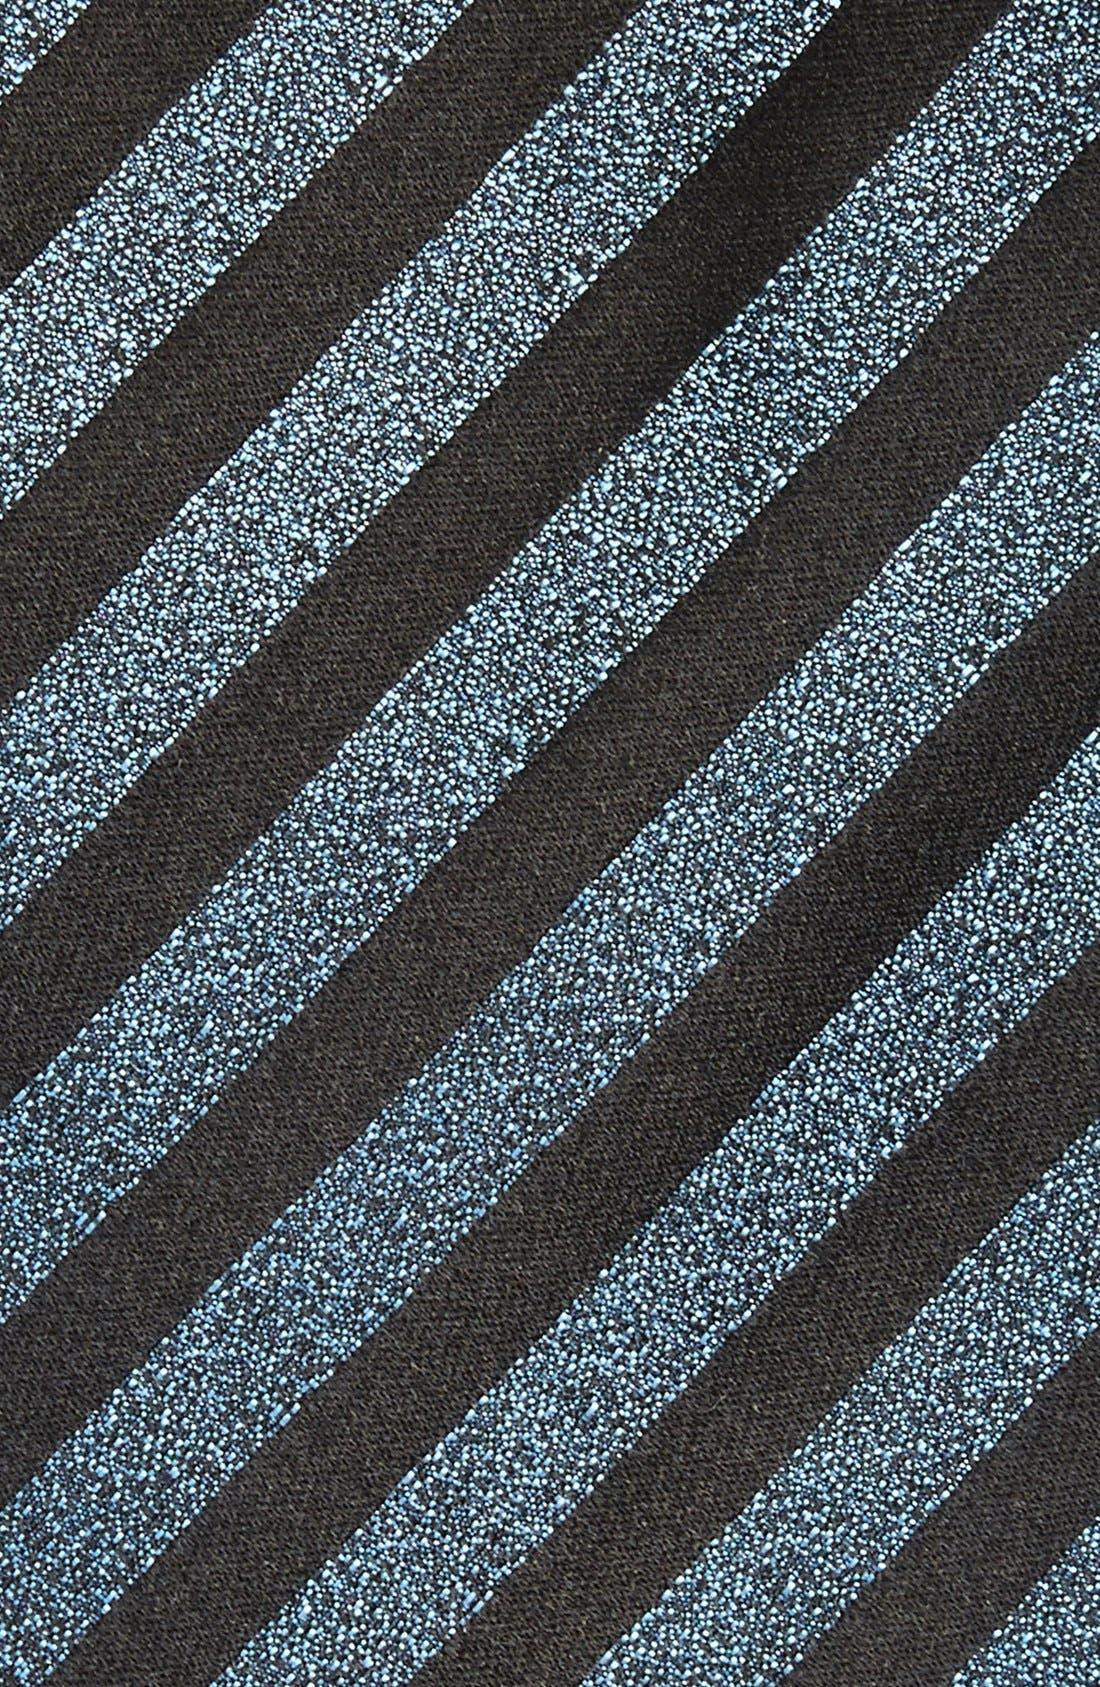 Alternate Image 2  - Yves Saint Laurent Woven Silk Tie